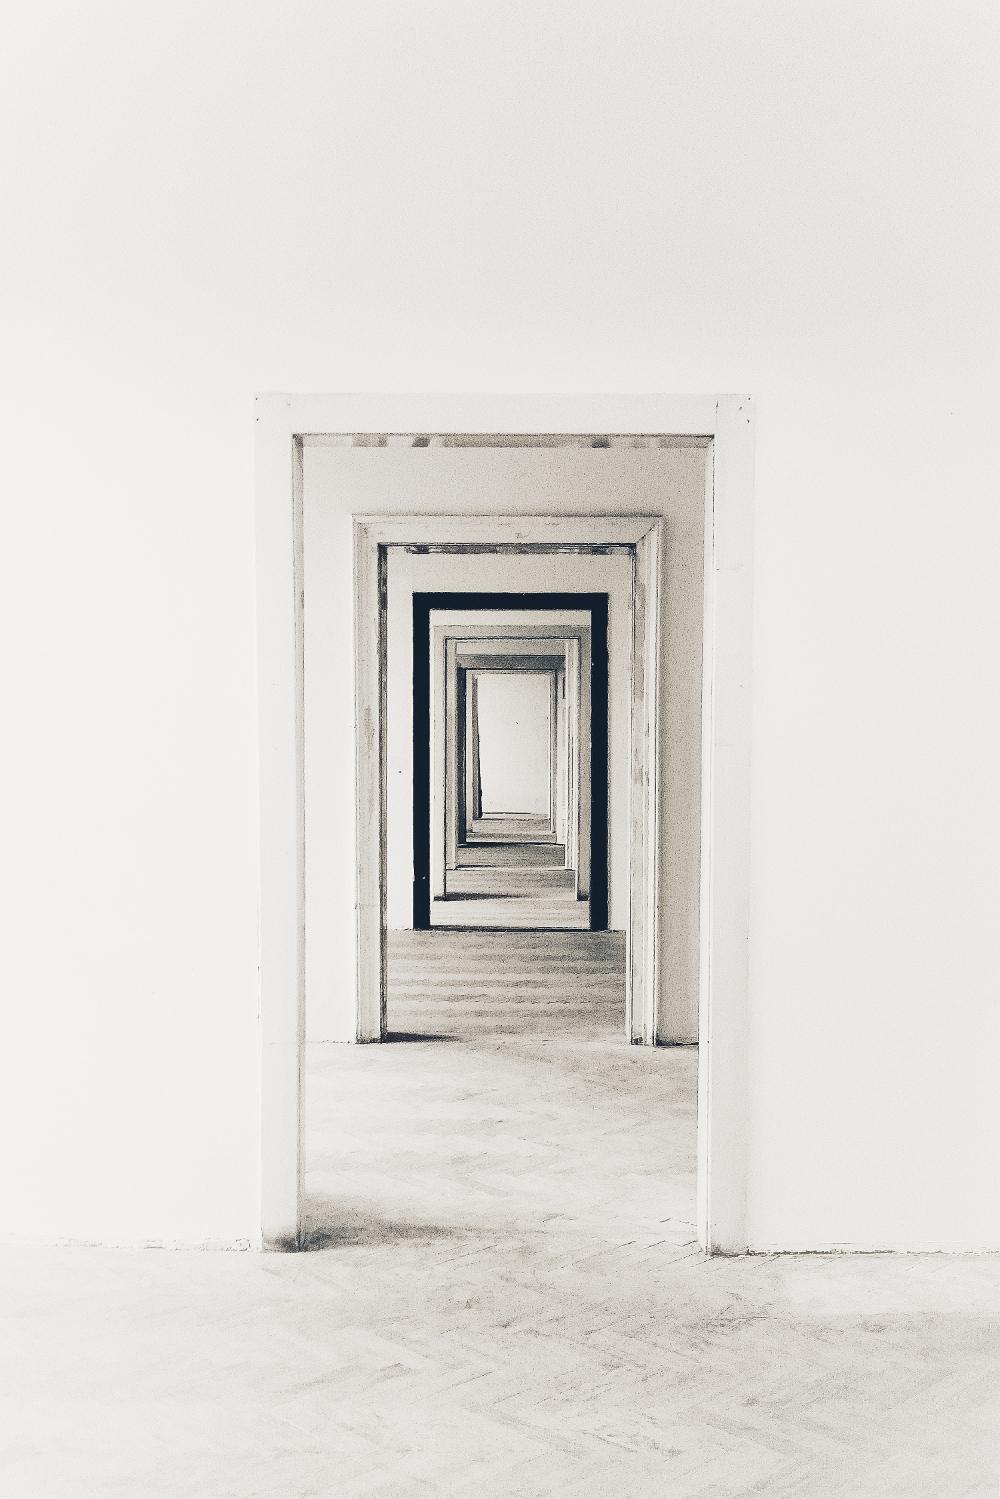 Segreto dietro la porta